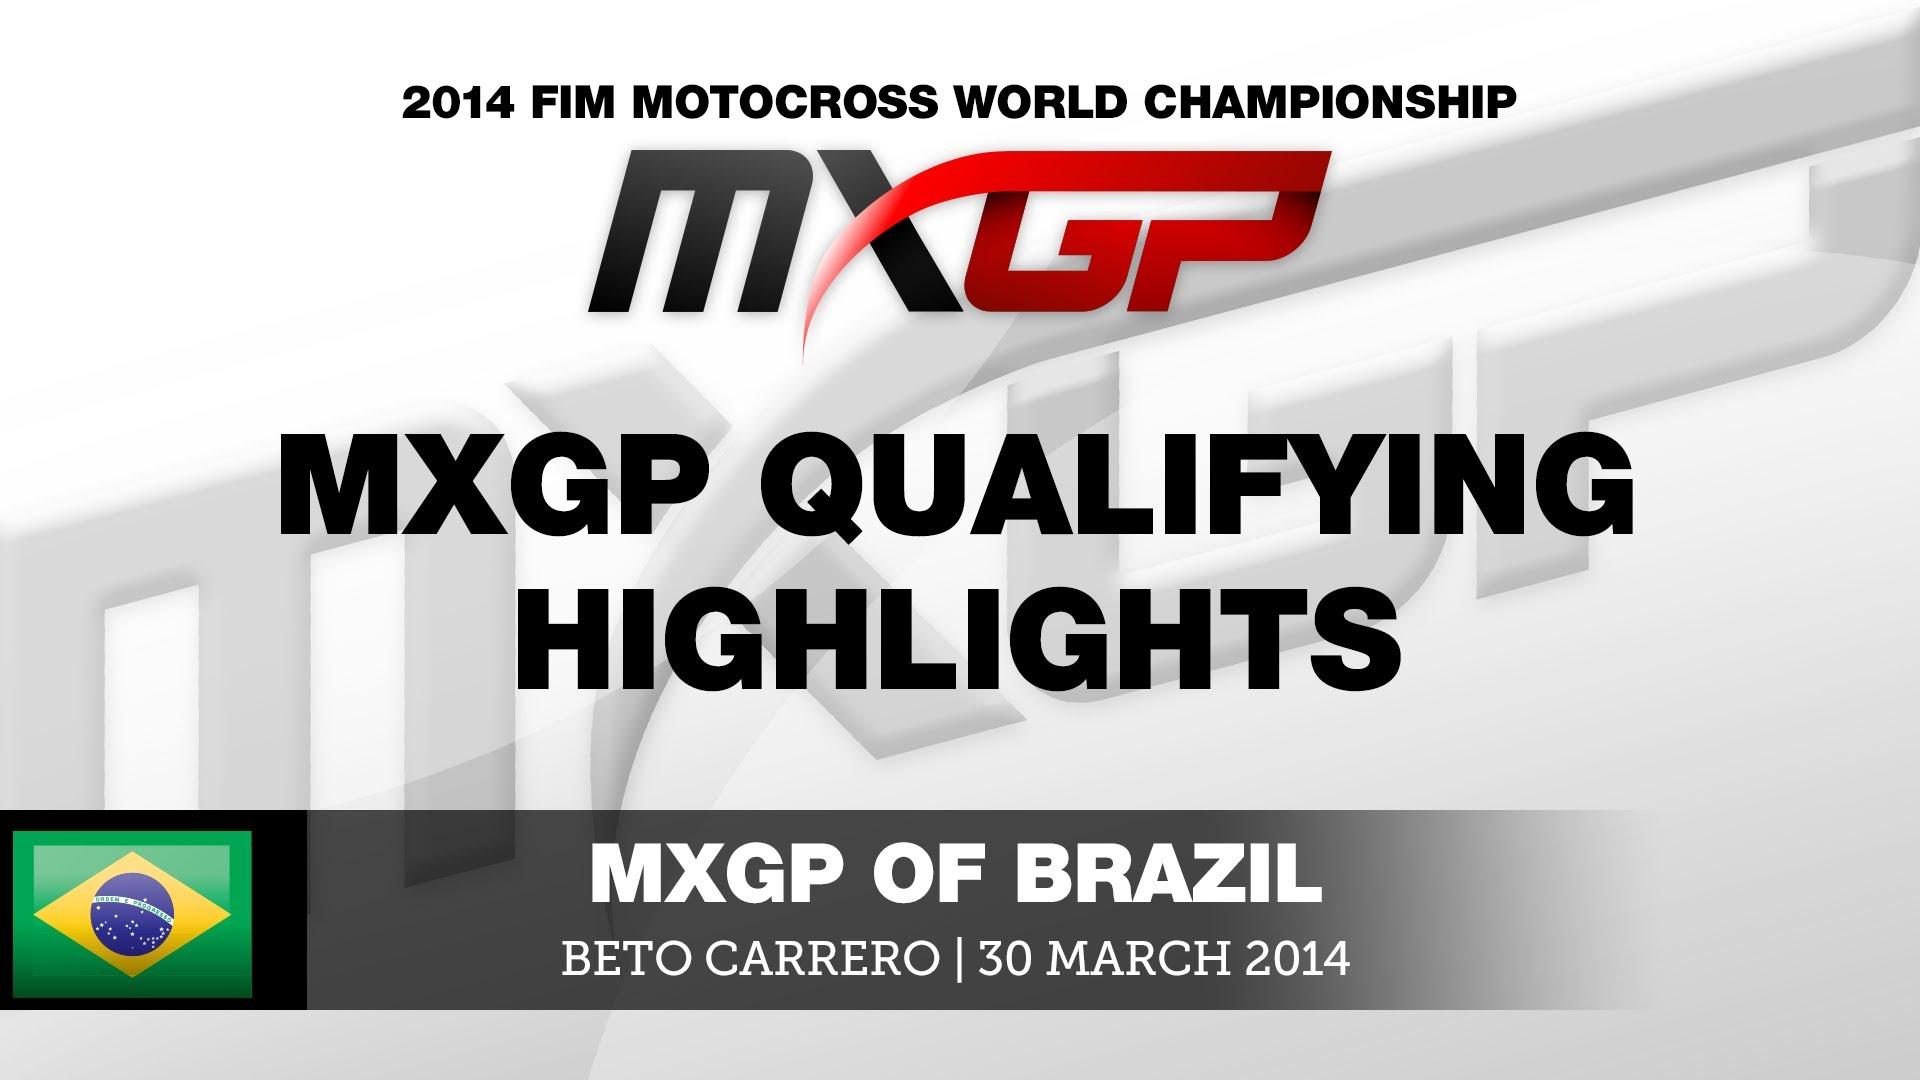 MXGP of Brazil 2014 Highlights + Kwalifikacje